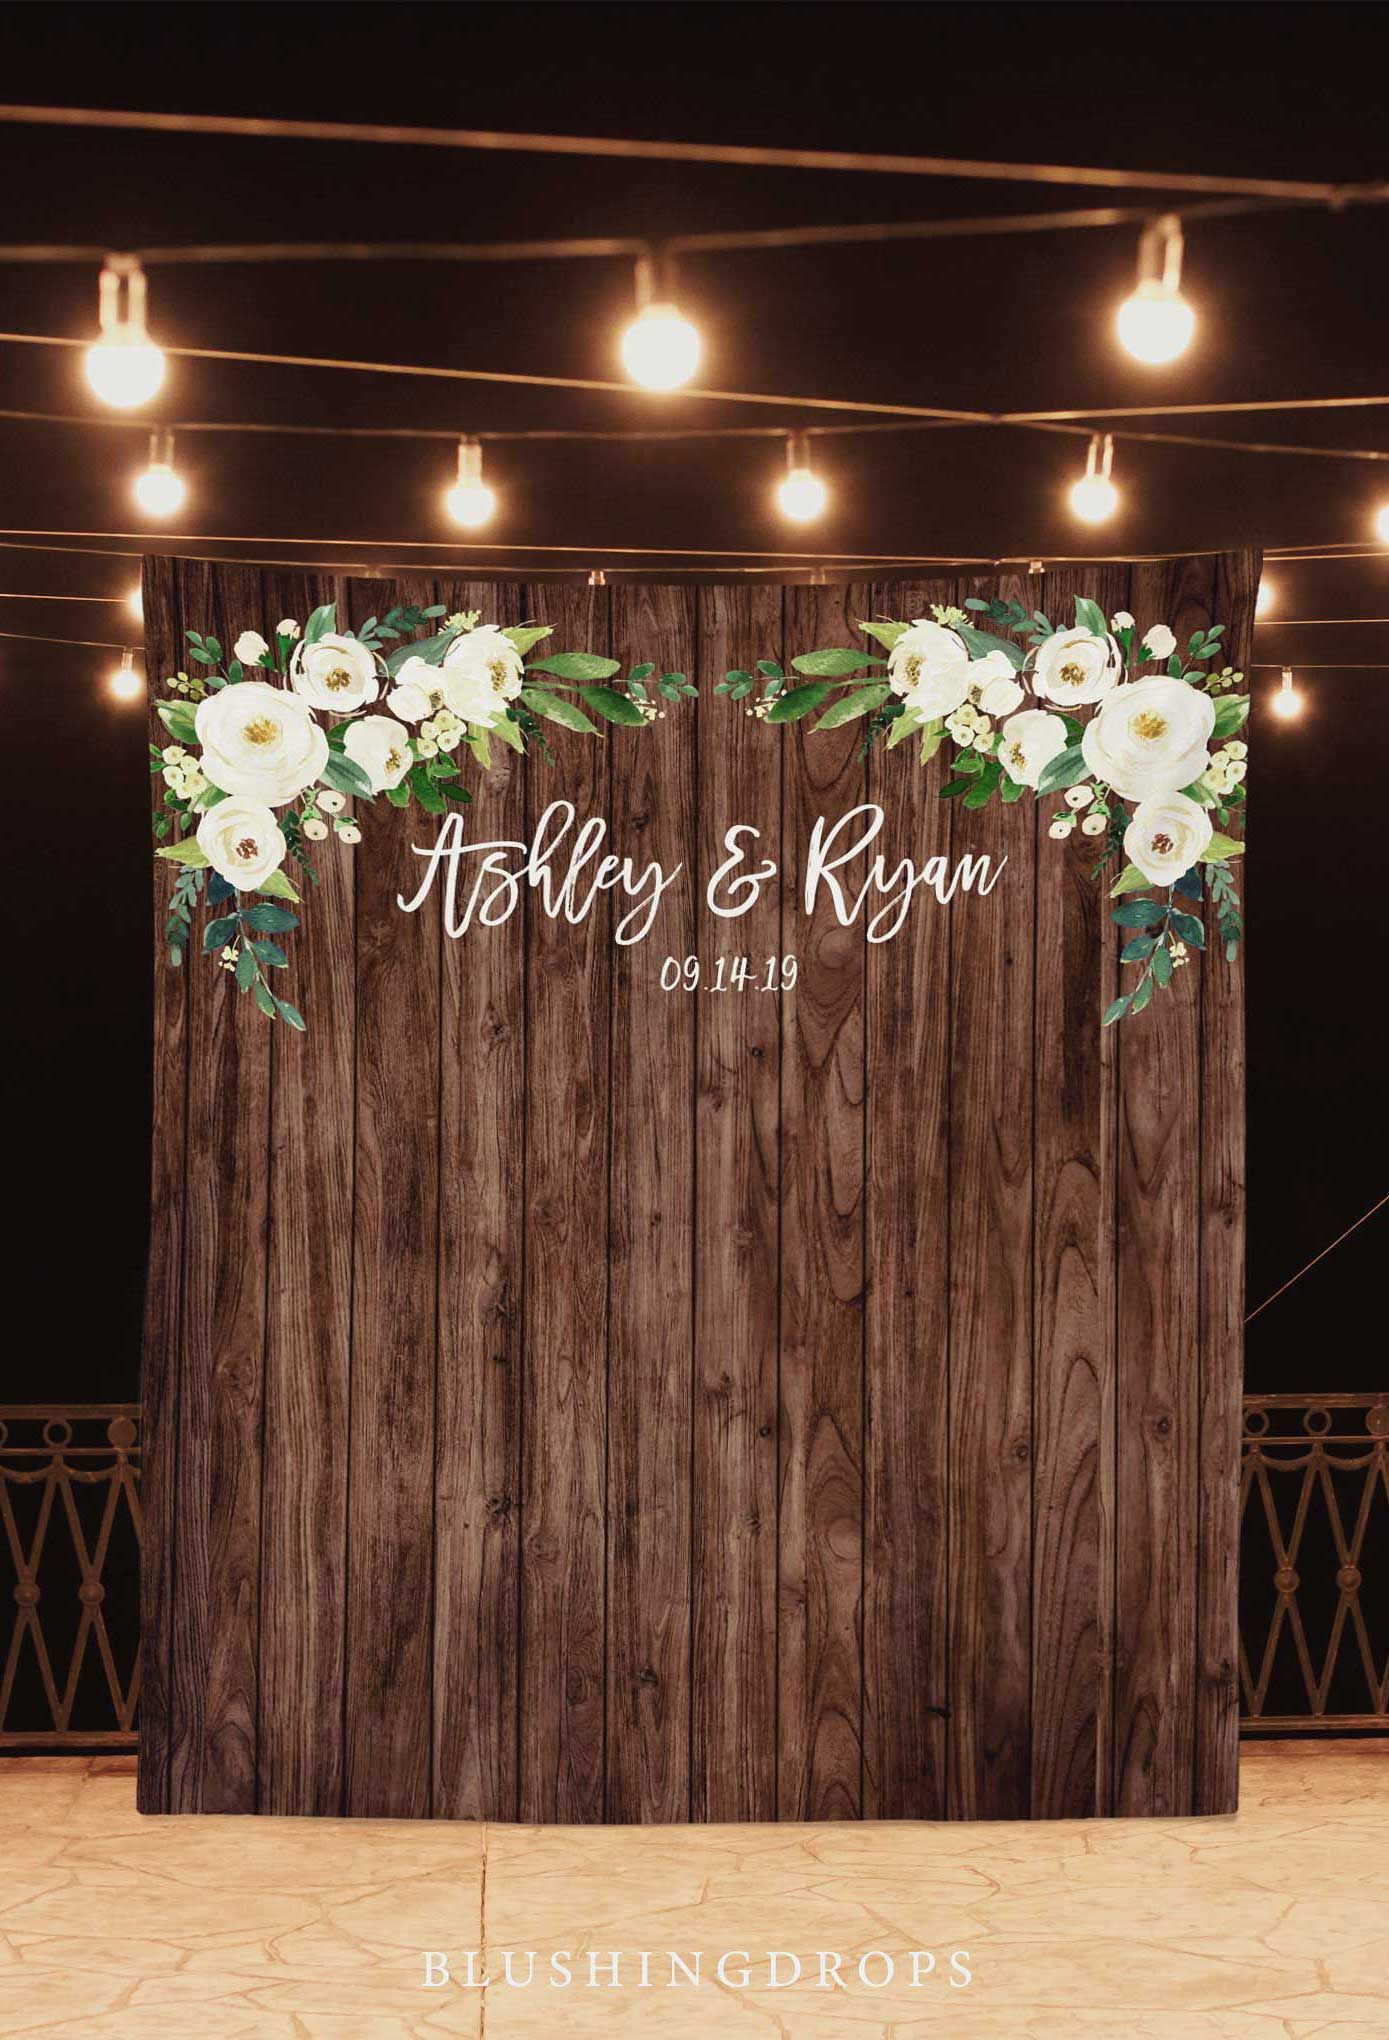 Wedding Photo Backdrop Rustic Wedding Decorations On A Budget